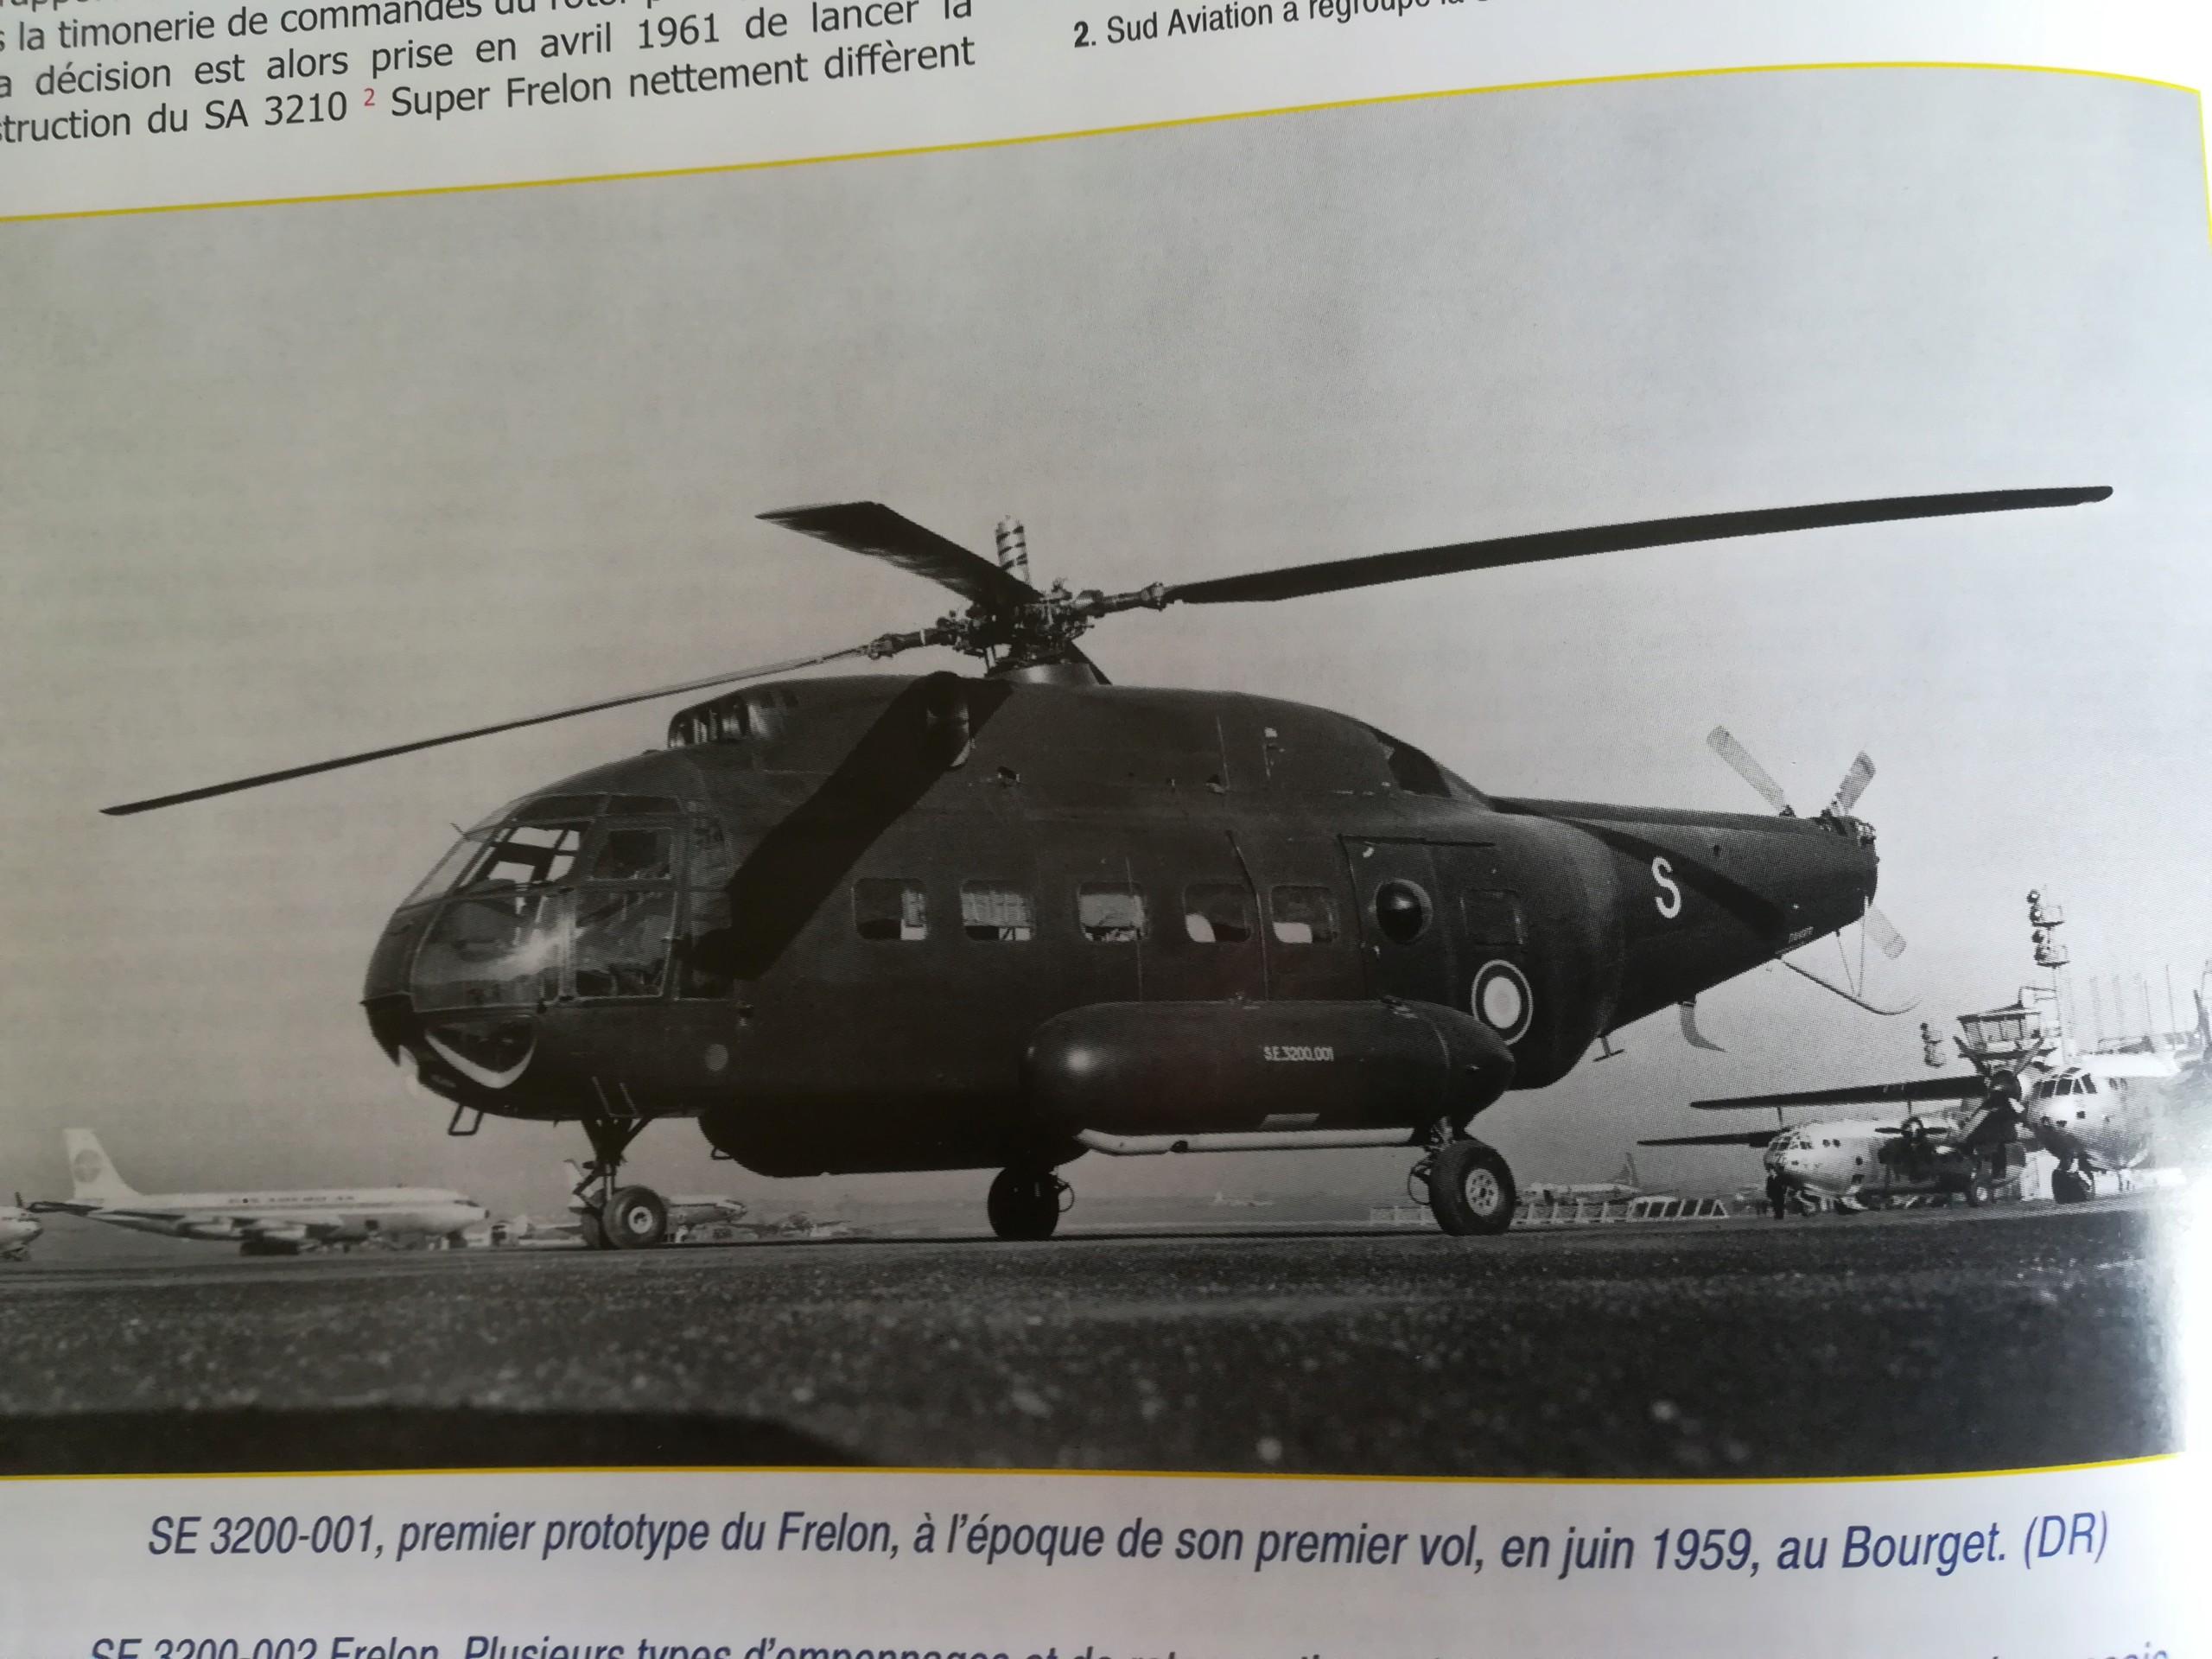 SUD AVIATION SE 3200 FRELON 1/50ème Réf 498 Img_2035